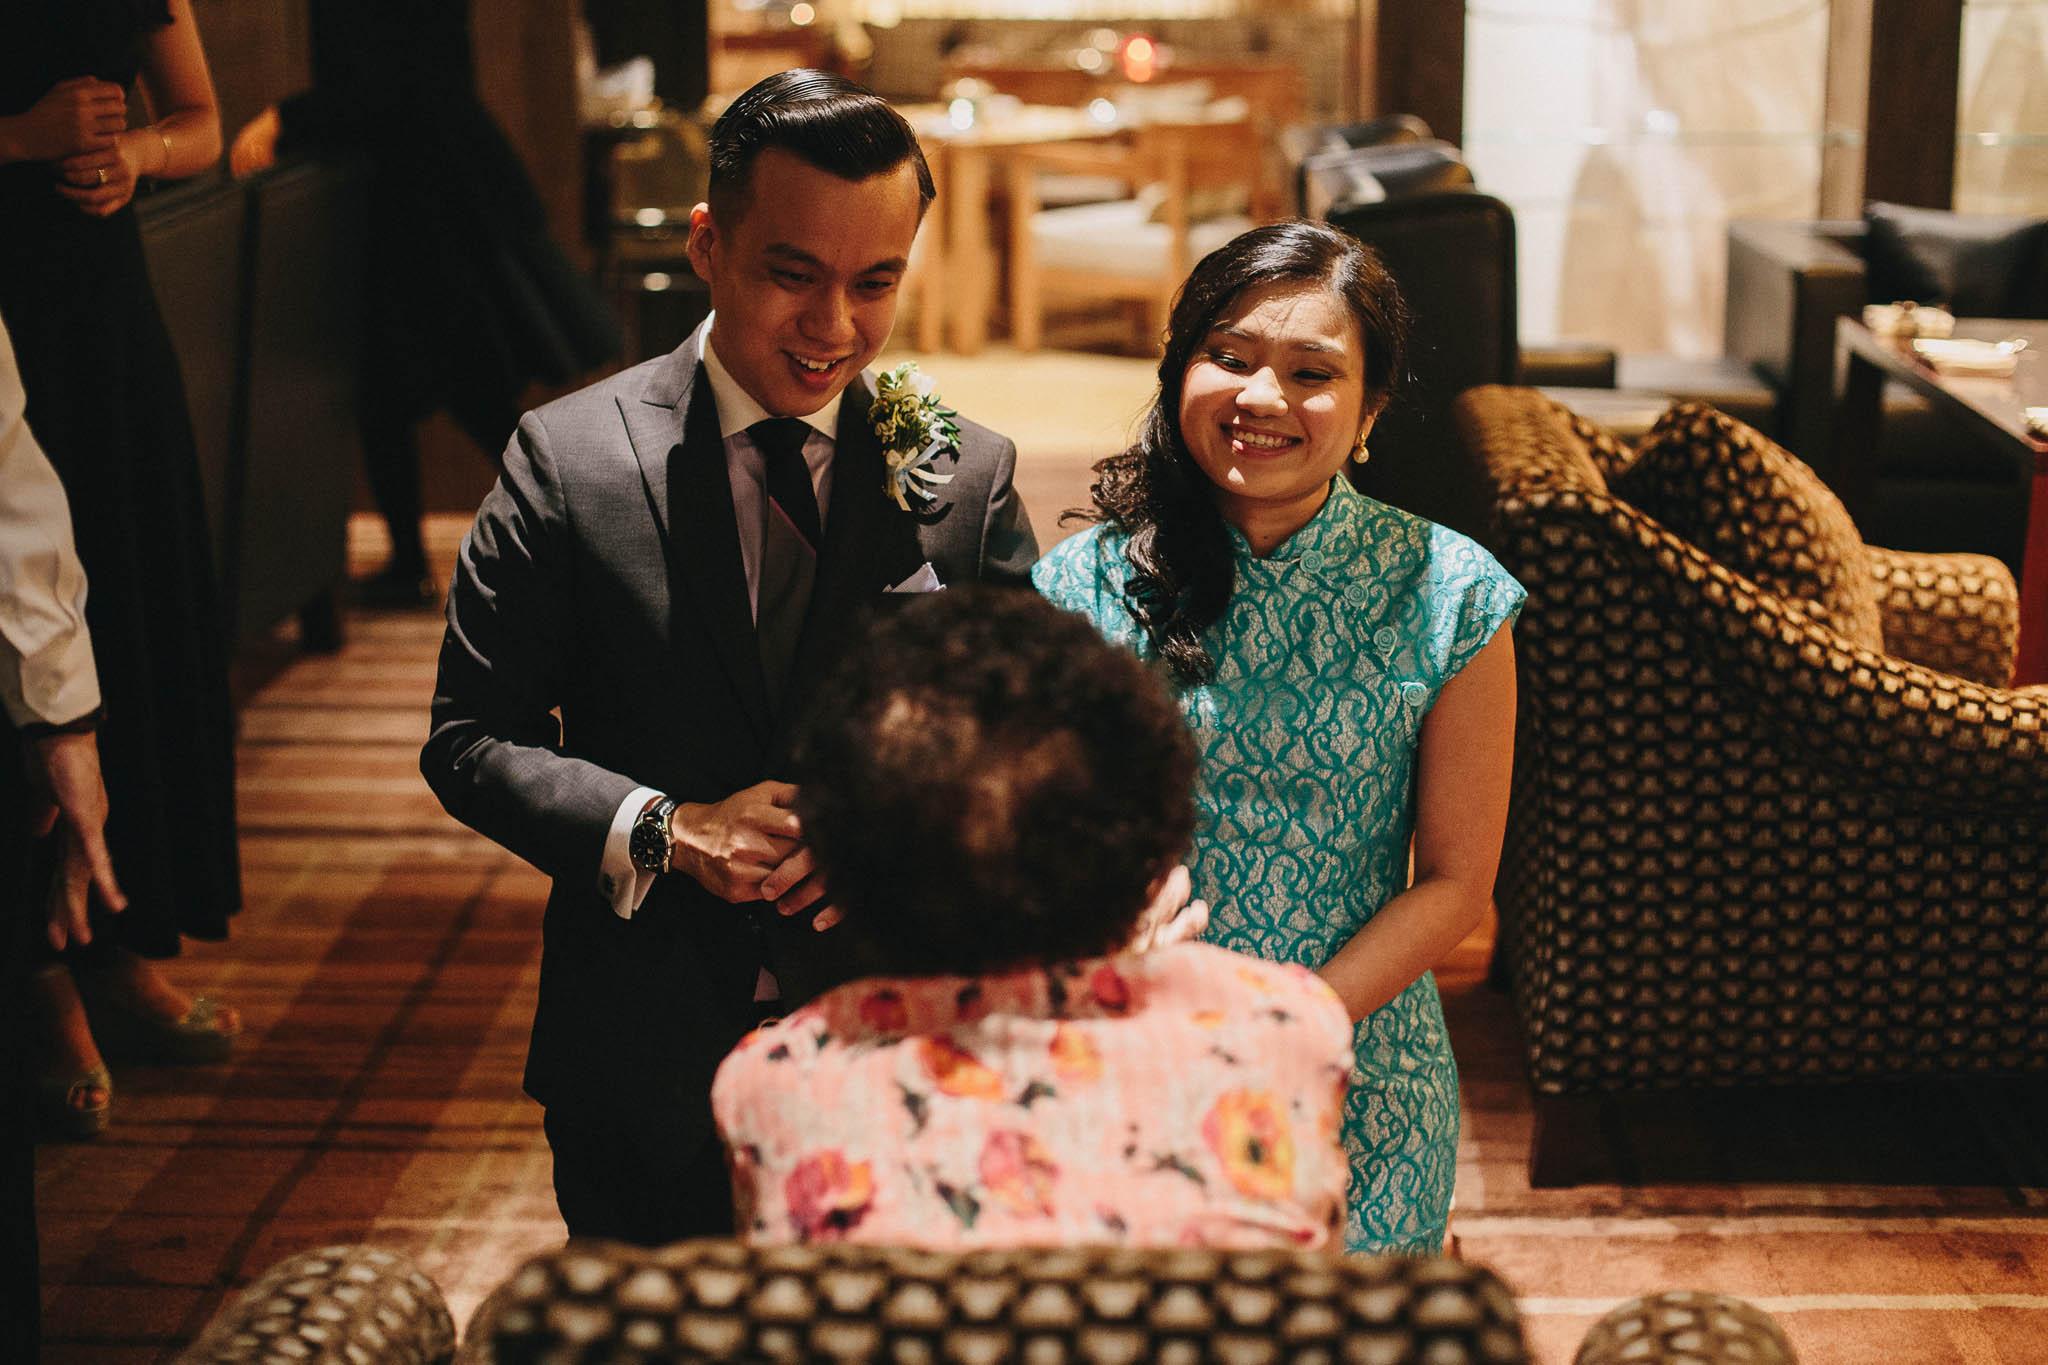 singapore-wedding-photographer-malay-indian-pre-wedding-travel-wmt-2015-jeremy-larissa-65.jpg